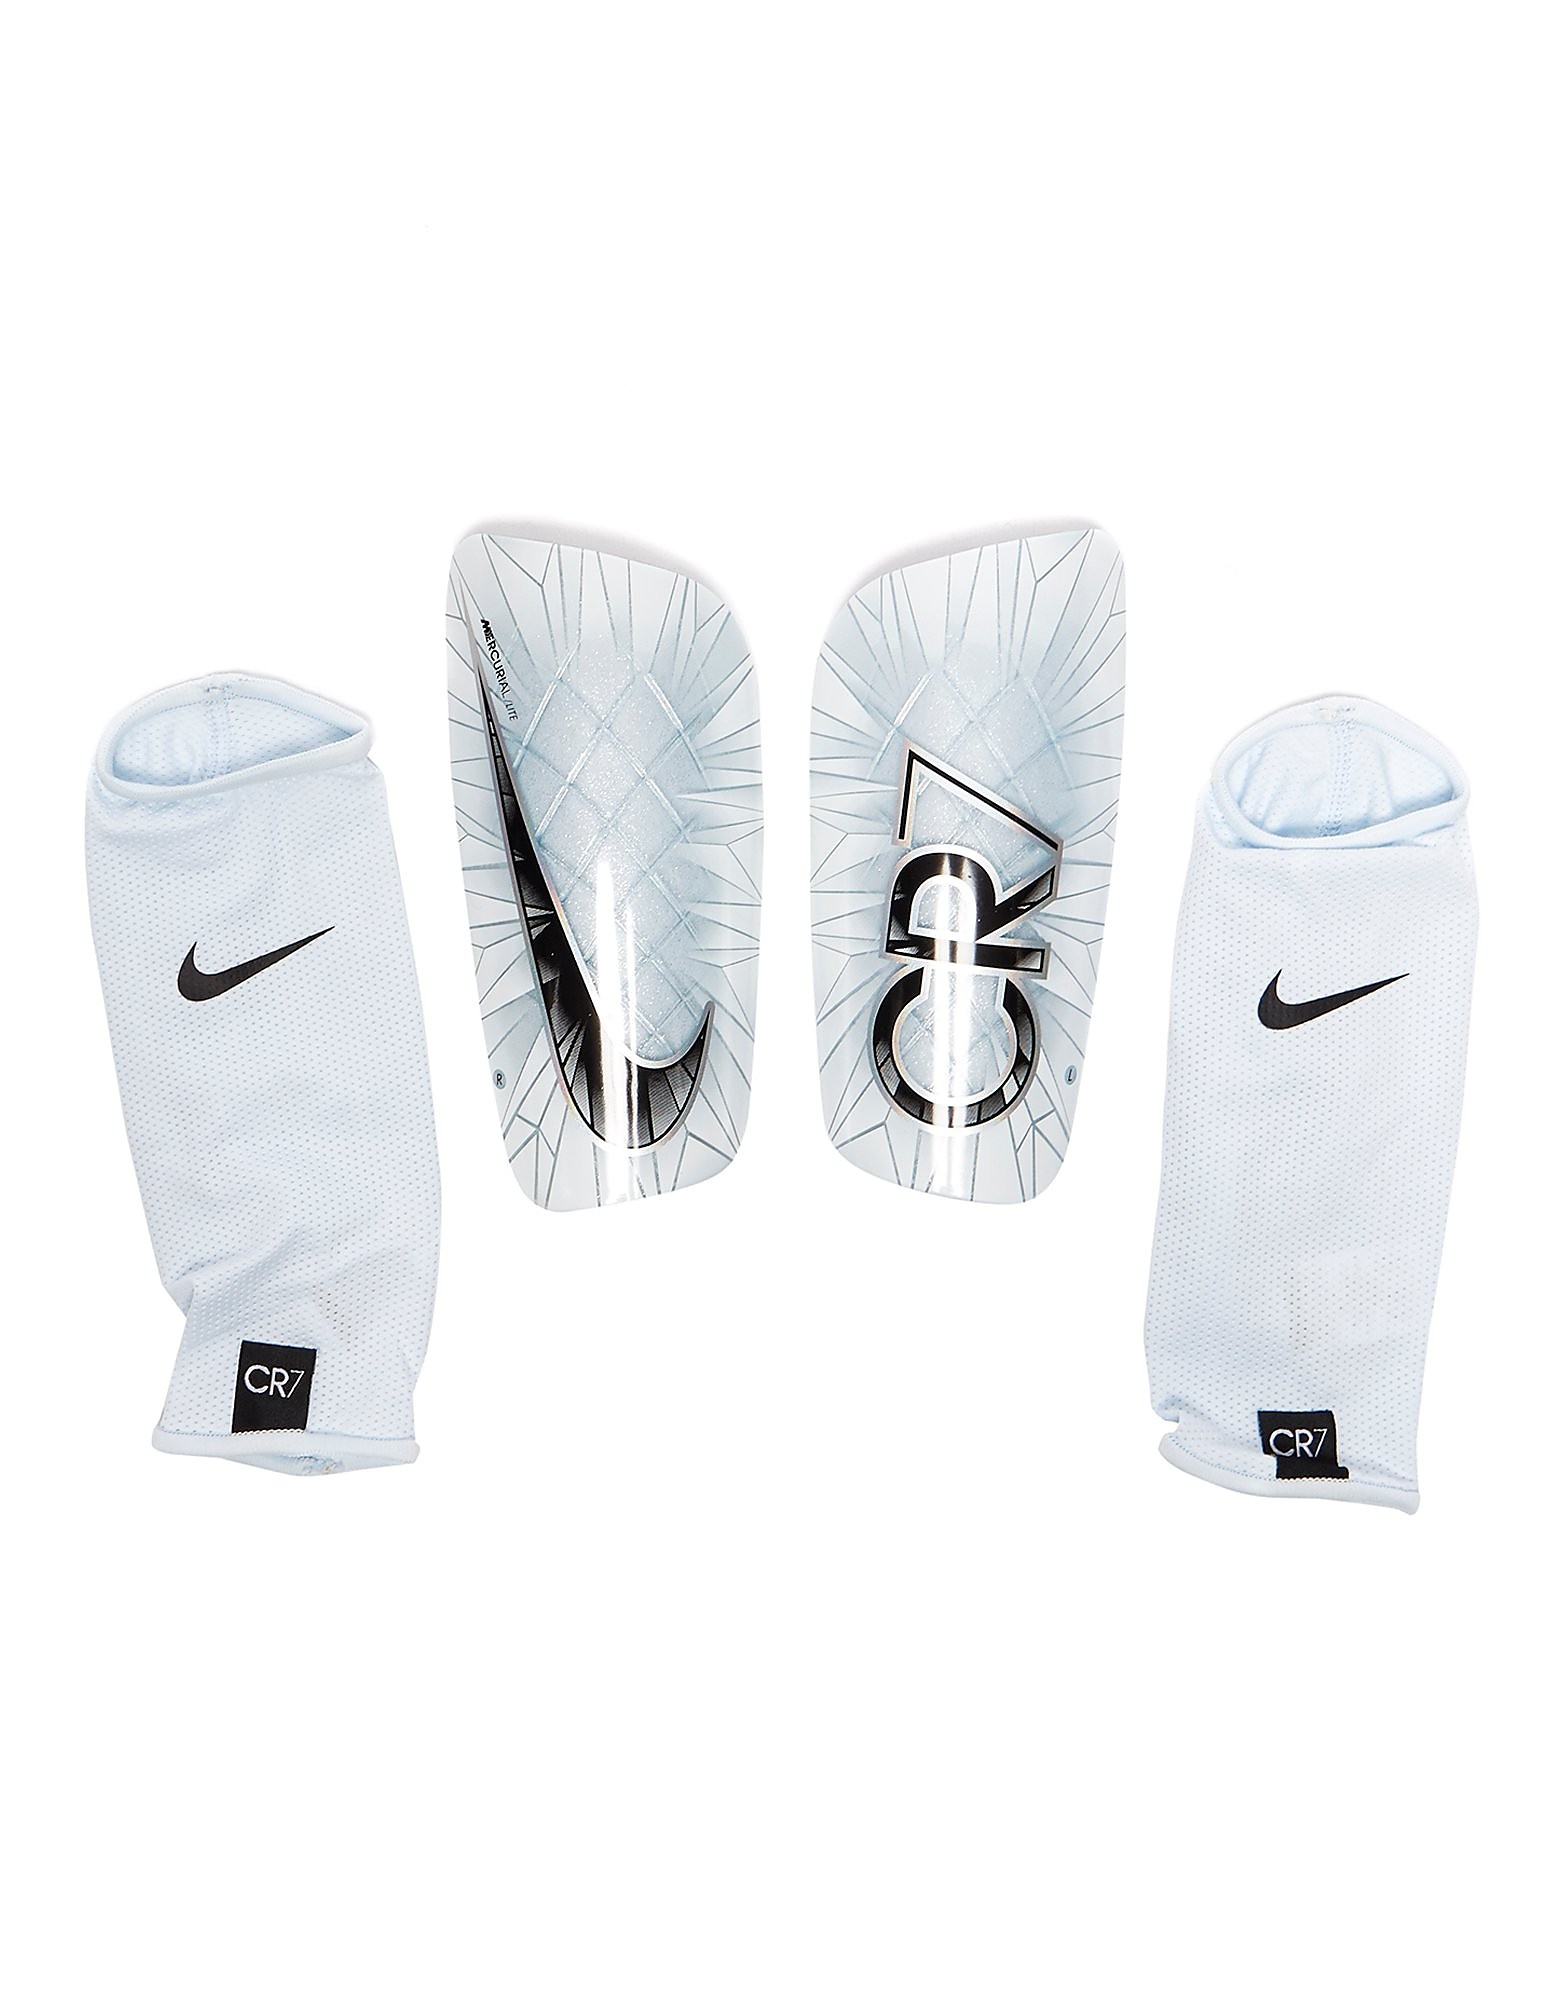 Nike CR7 Mercurial Lite Schienbeinschoner